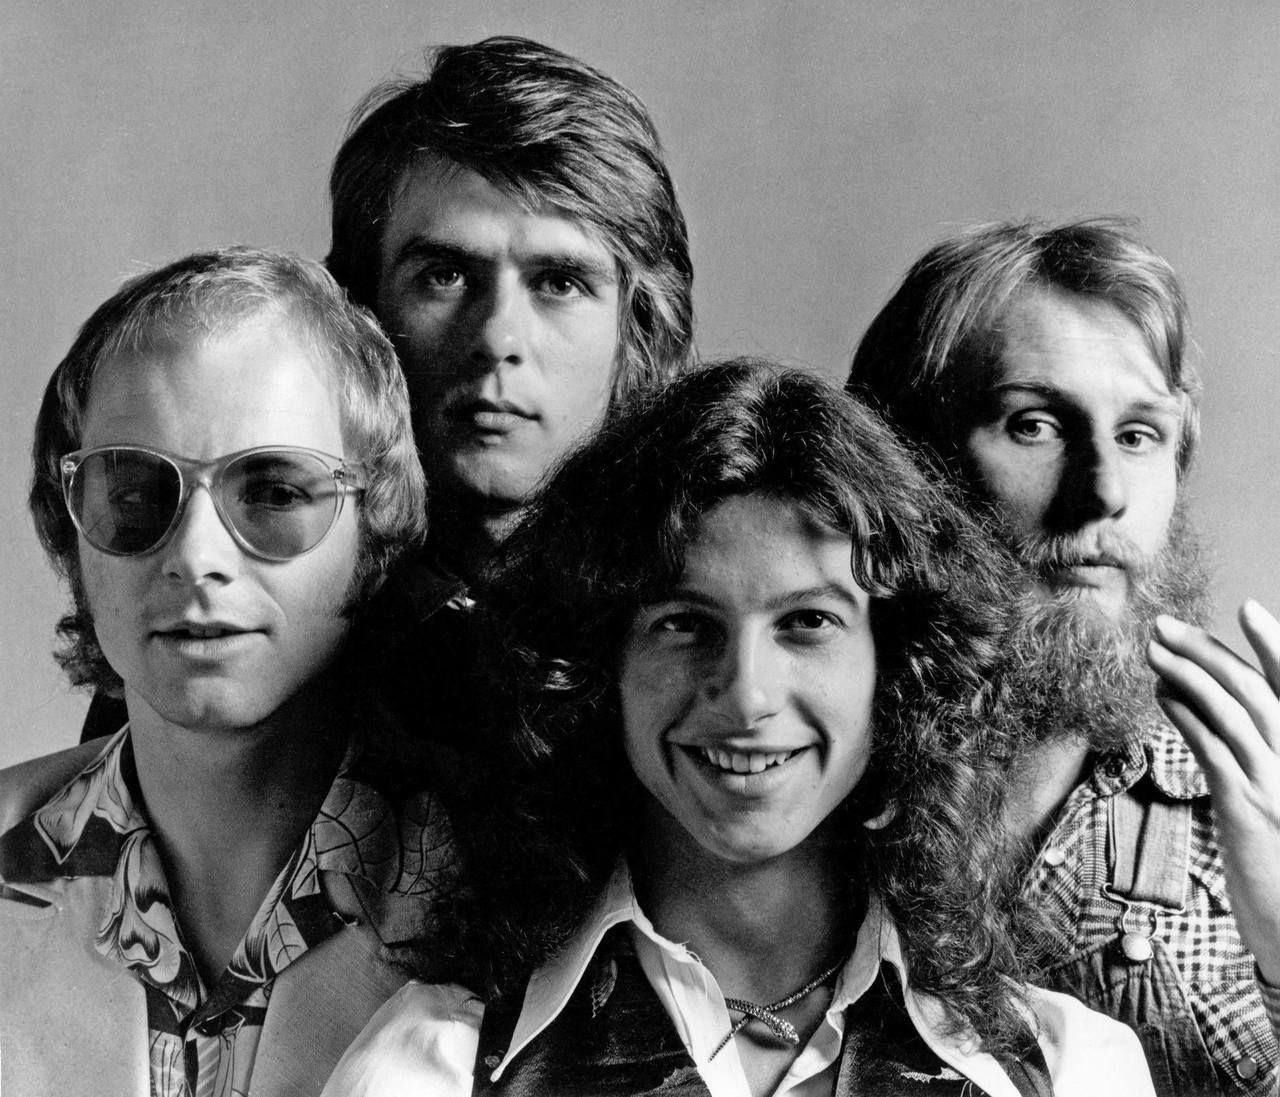 Wishbone Ash - Andy Powell | Good music, Couple photos, Andy